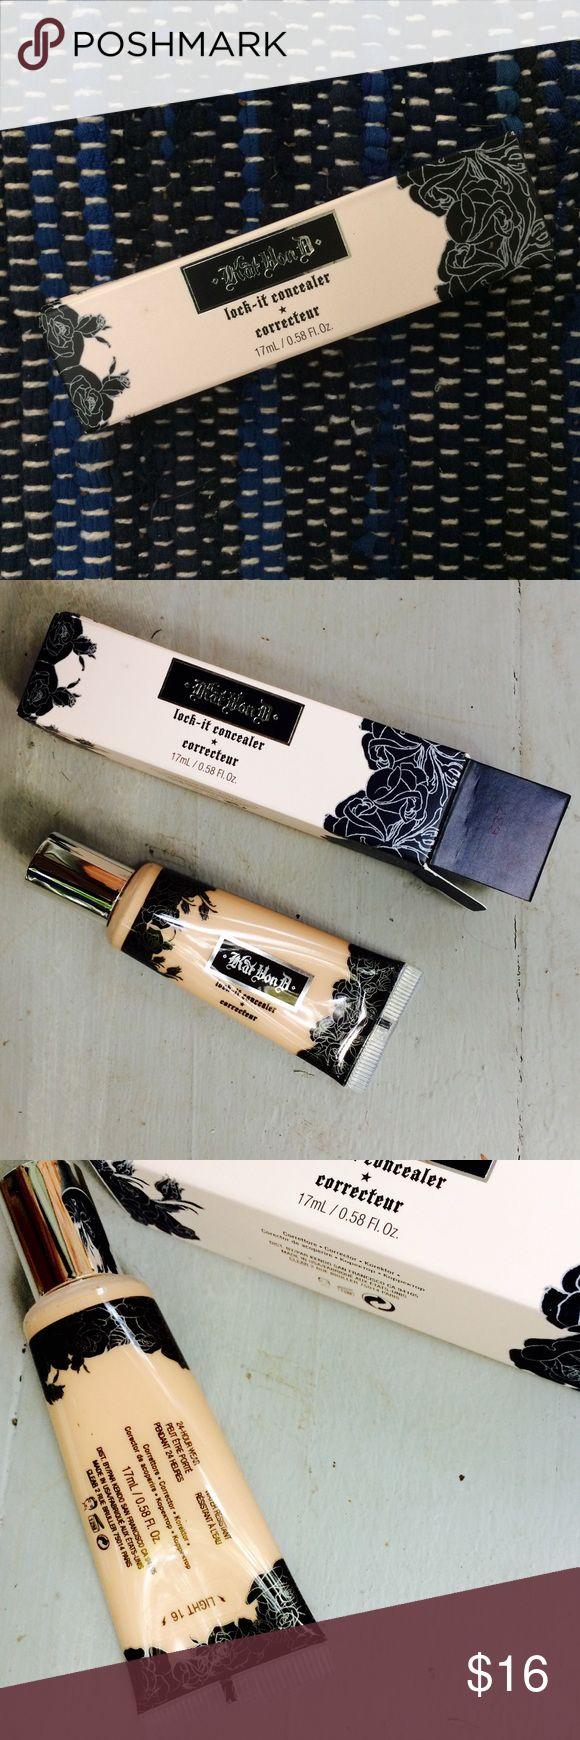 Kat Von D Lock-It concealer in Light (BNWB) Brand new Kat Von D Lock-It concealer/corrector. Never been used! All product information on box is pictured :) Kat Von D Makeup Concealer